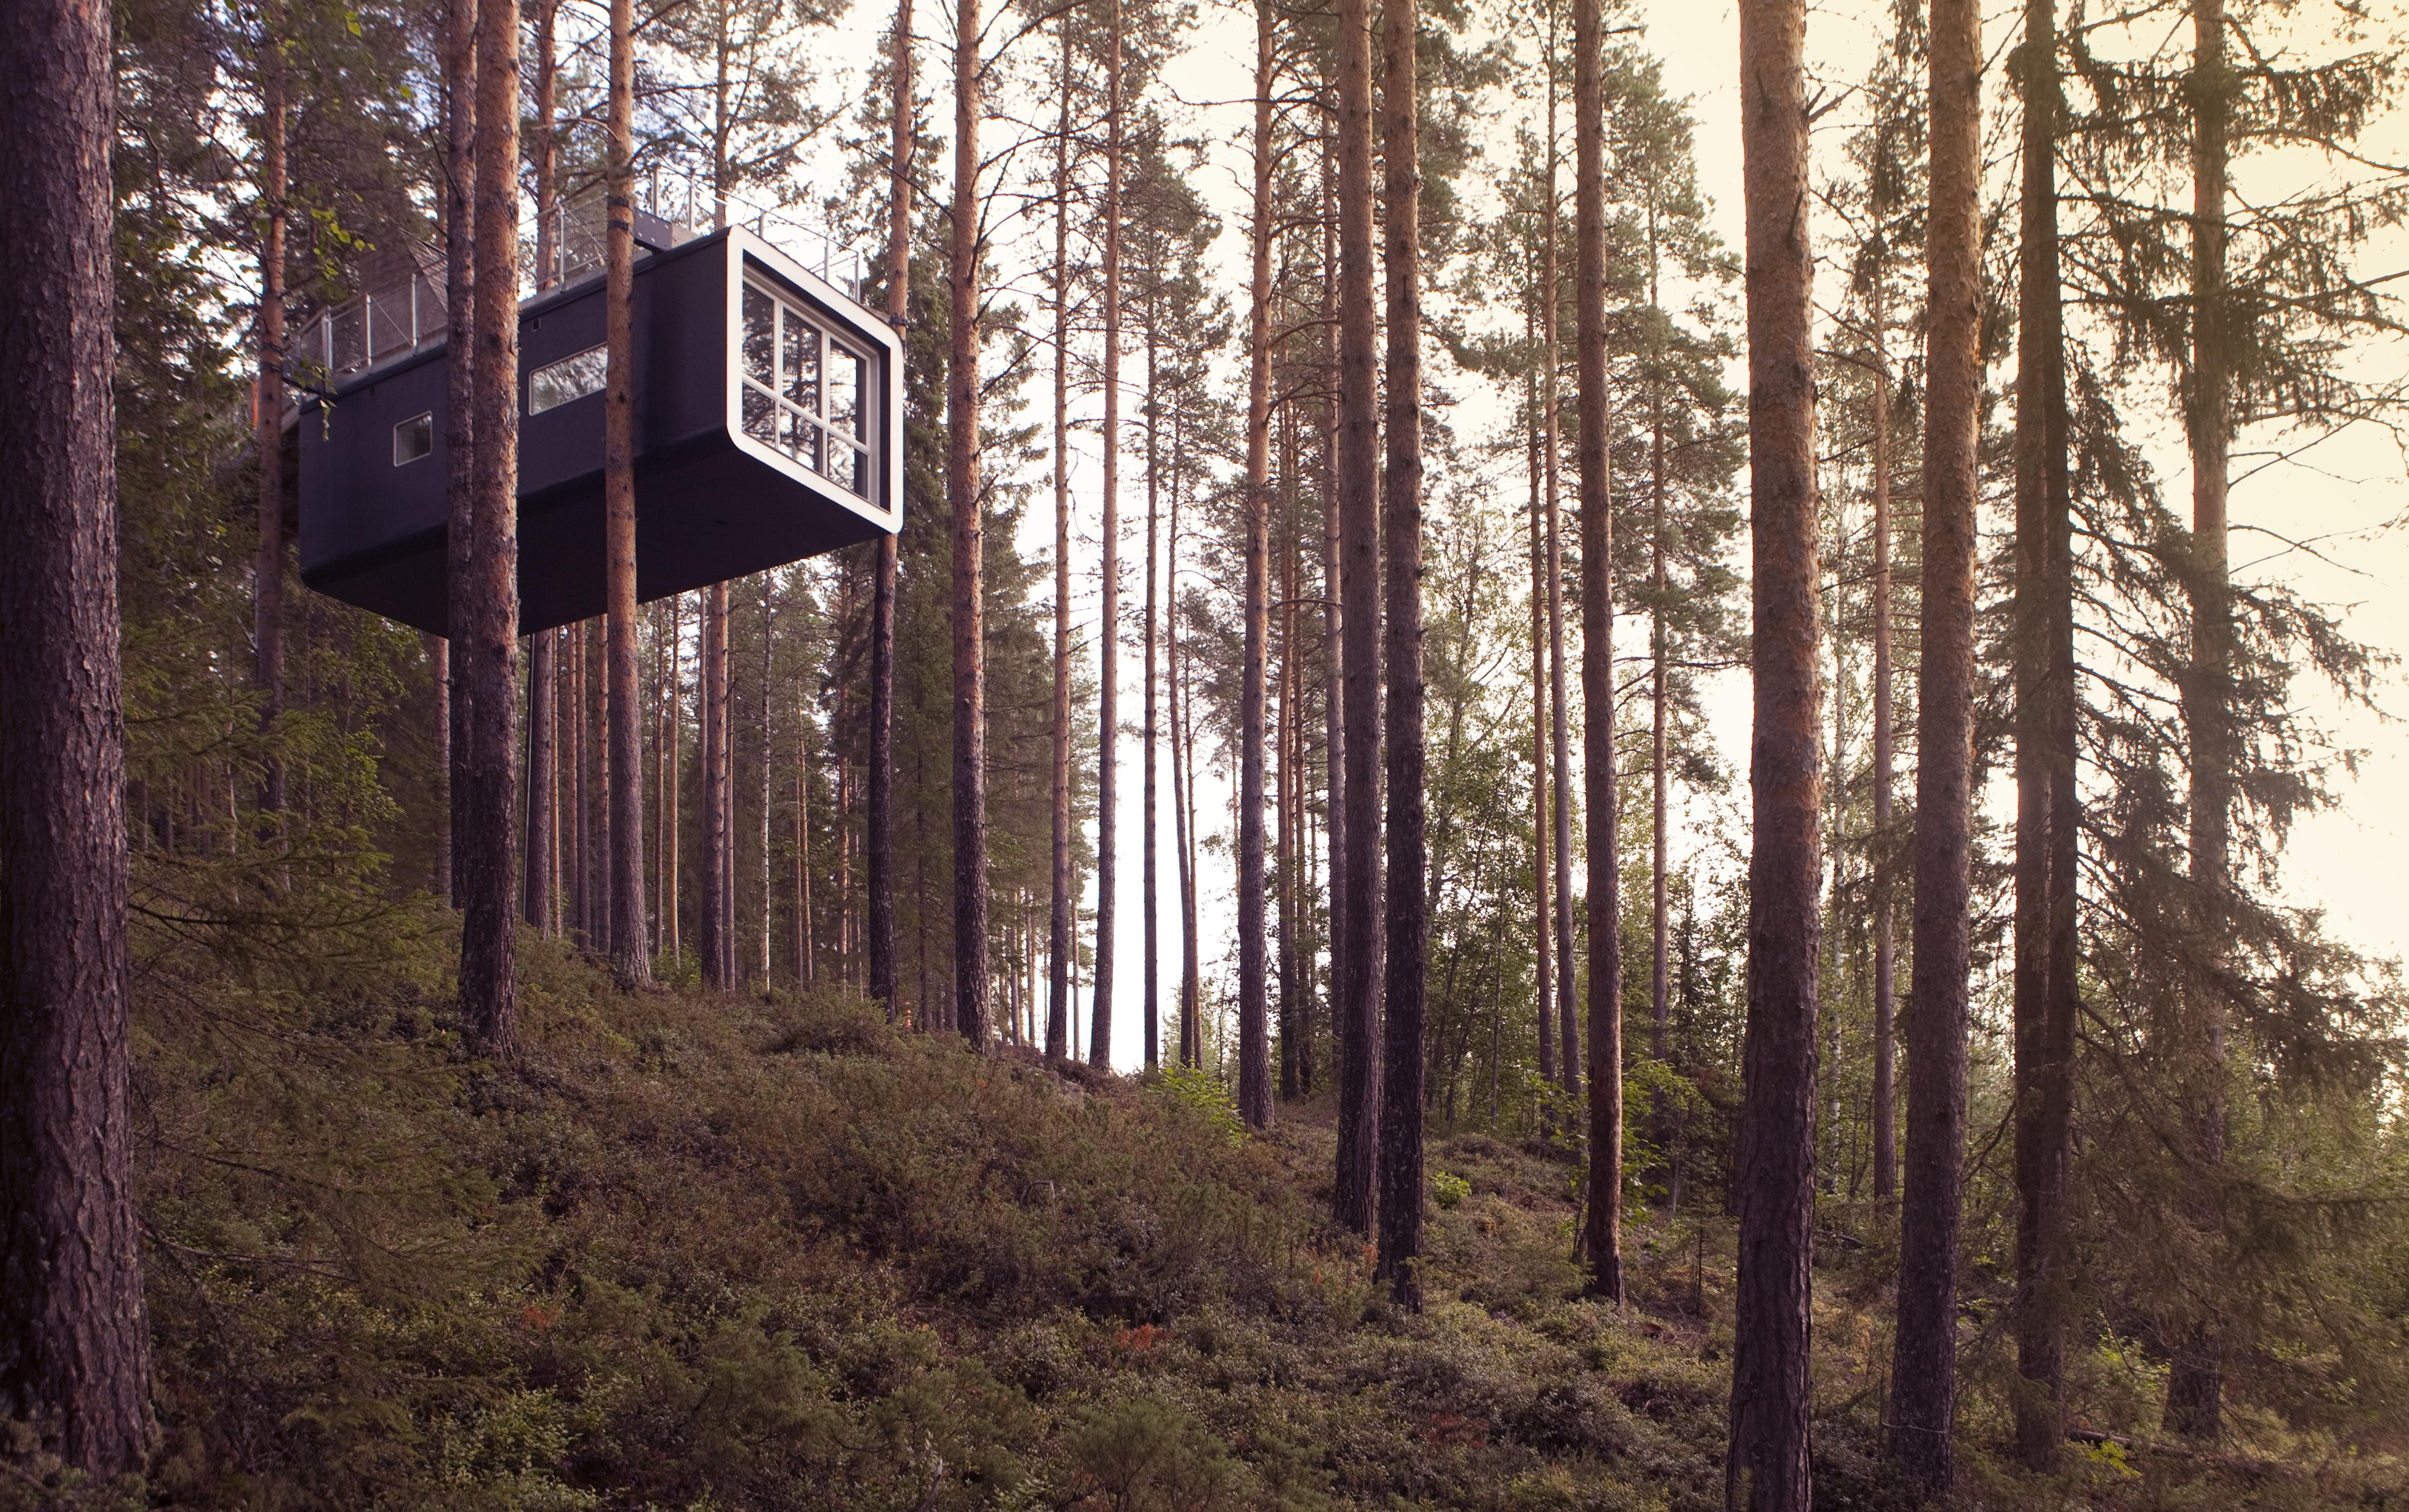 Wonderful image of Worlds Best Log Cabins Joy Studio Design Gallery Best Design with #897042 color and 5185x3255 pixels